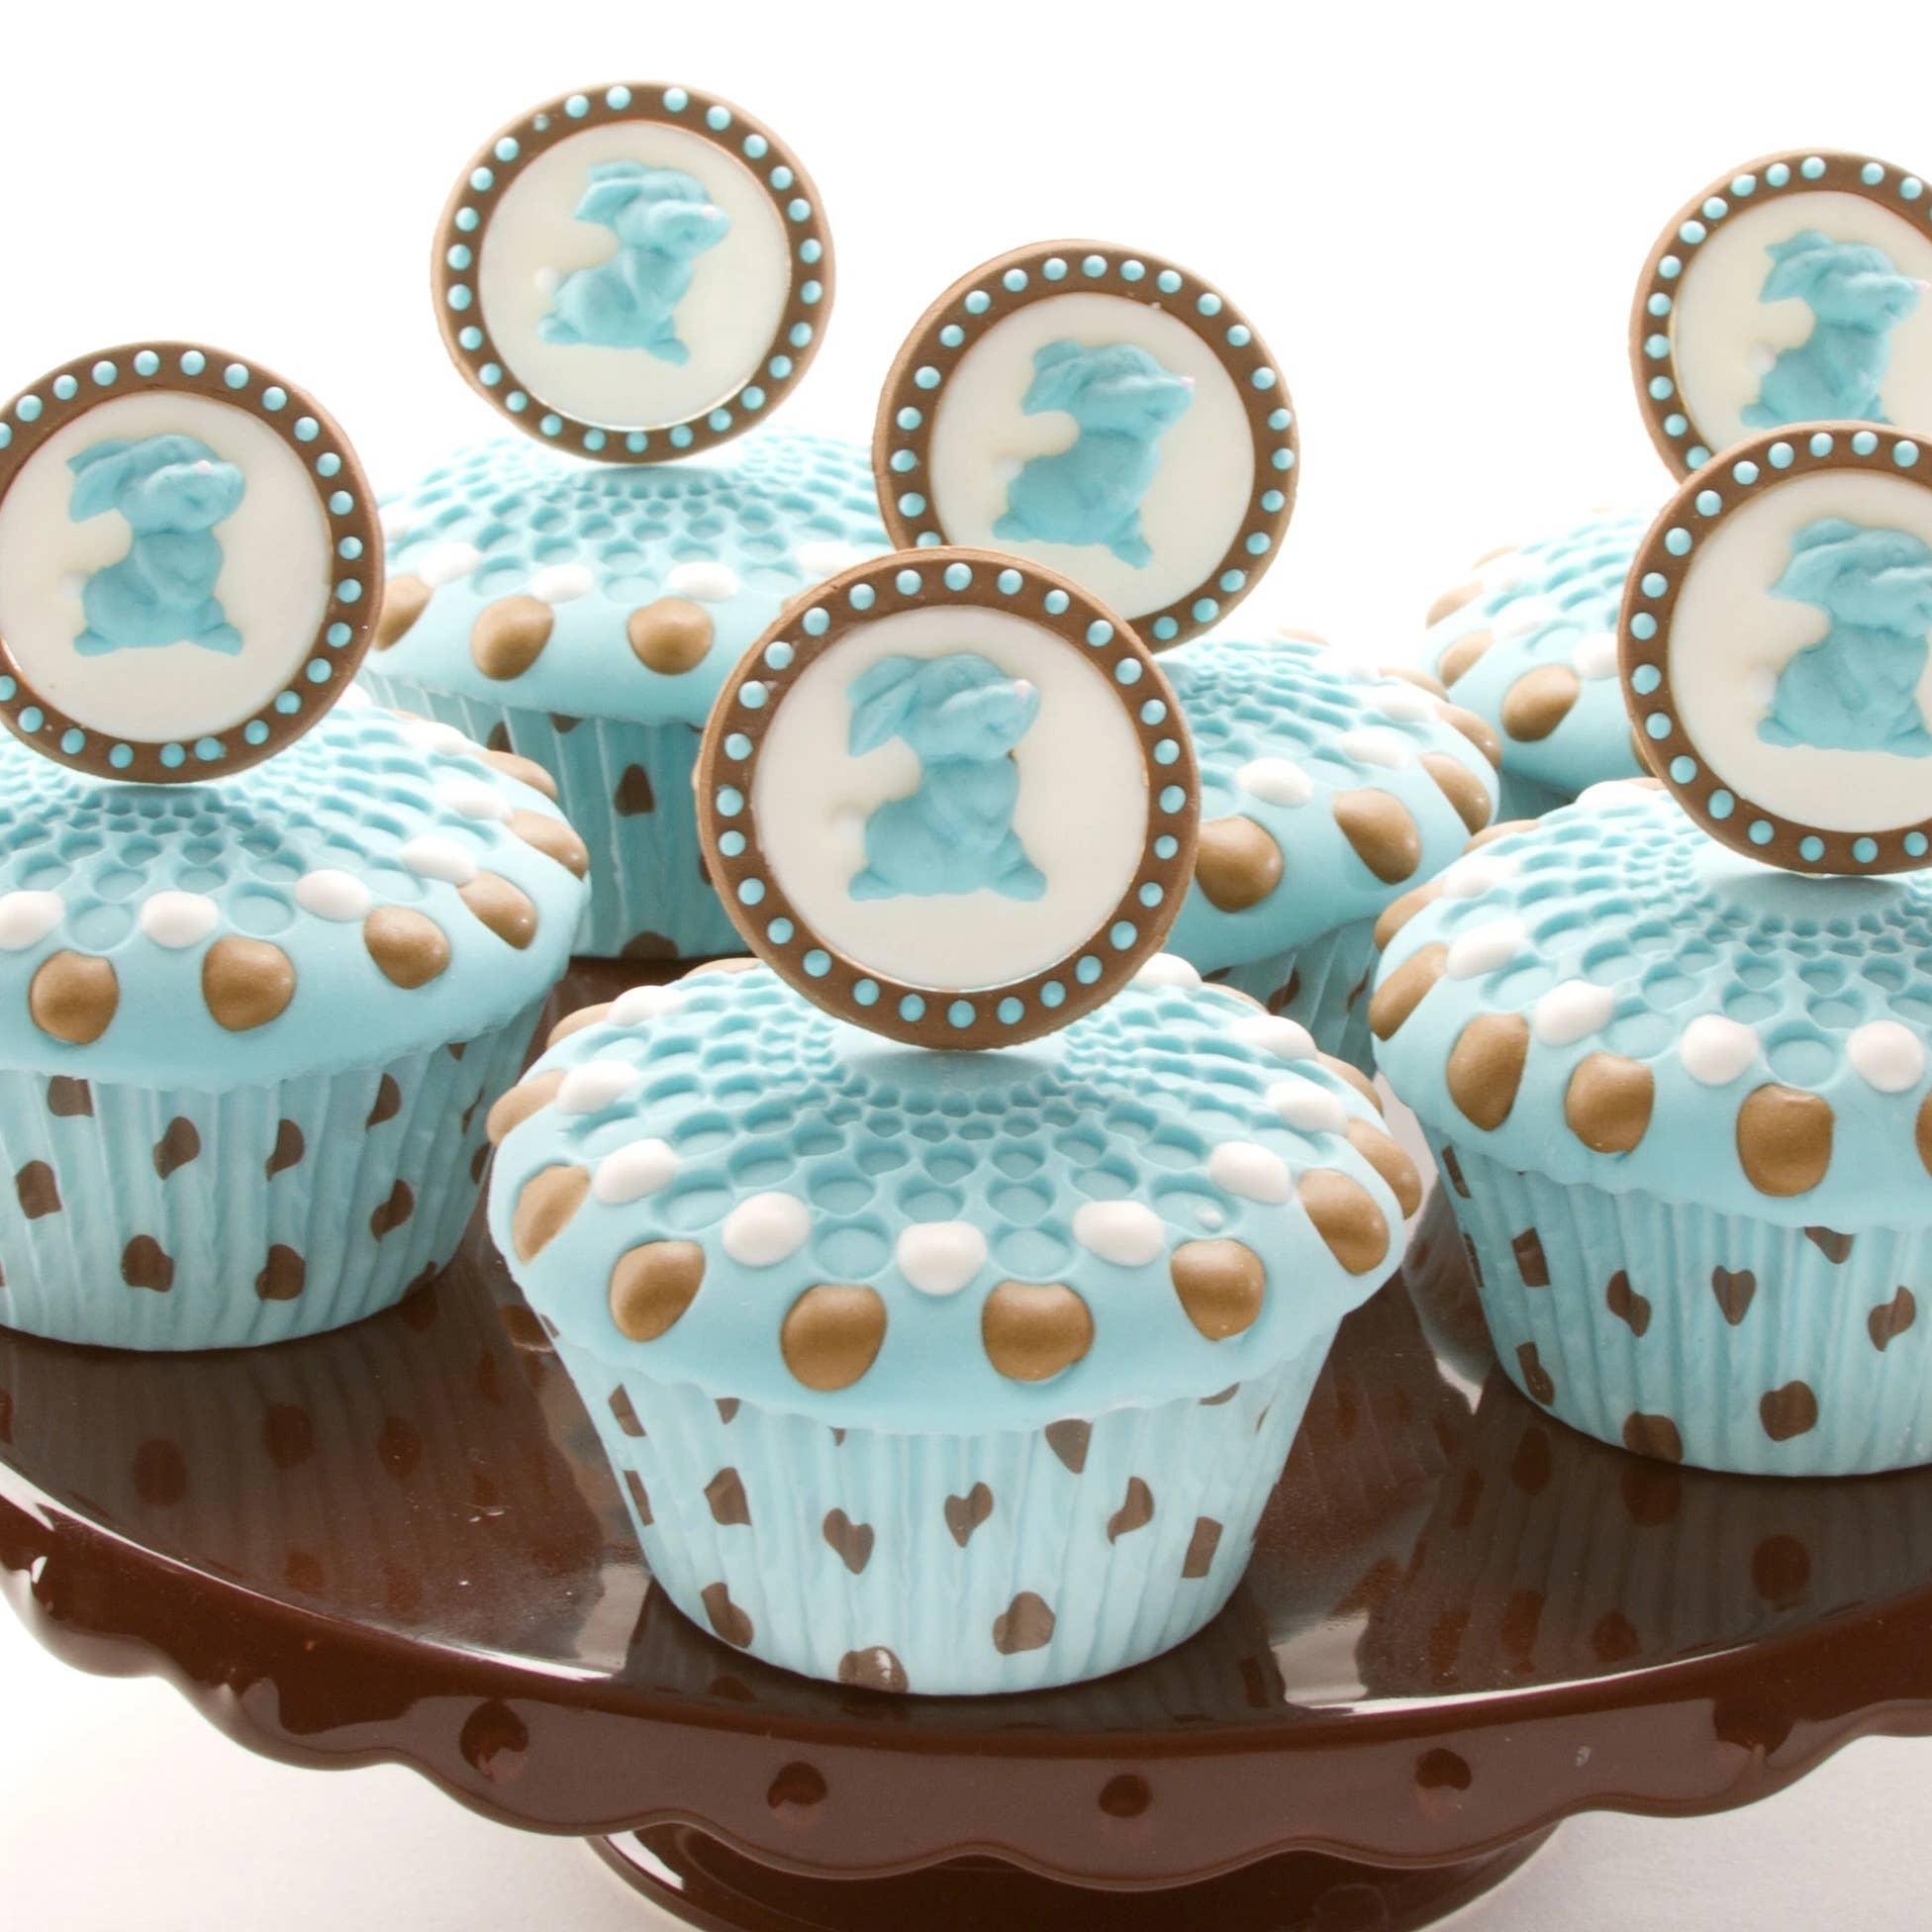 Impression Maille Stencilromantique Garlanddécoration gâteau Craft Cupcakes